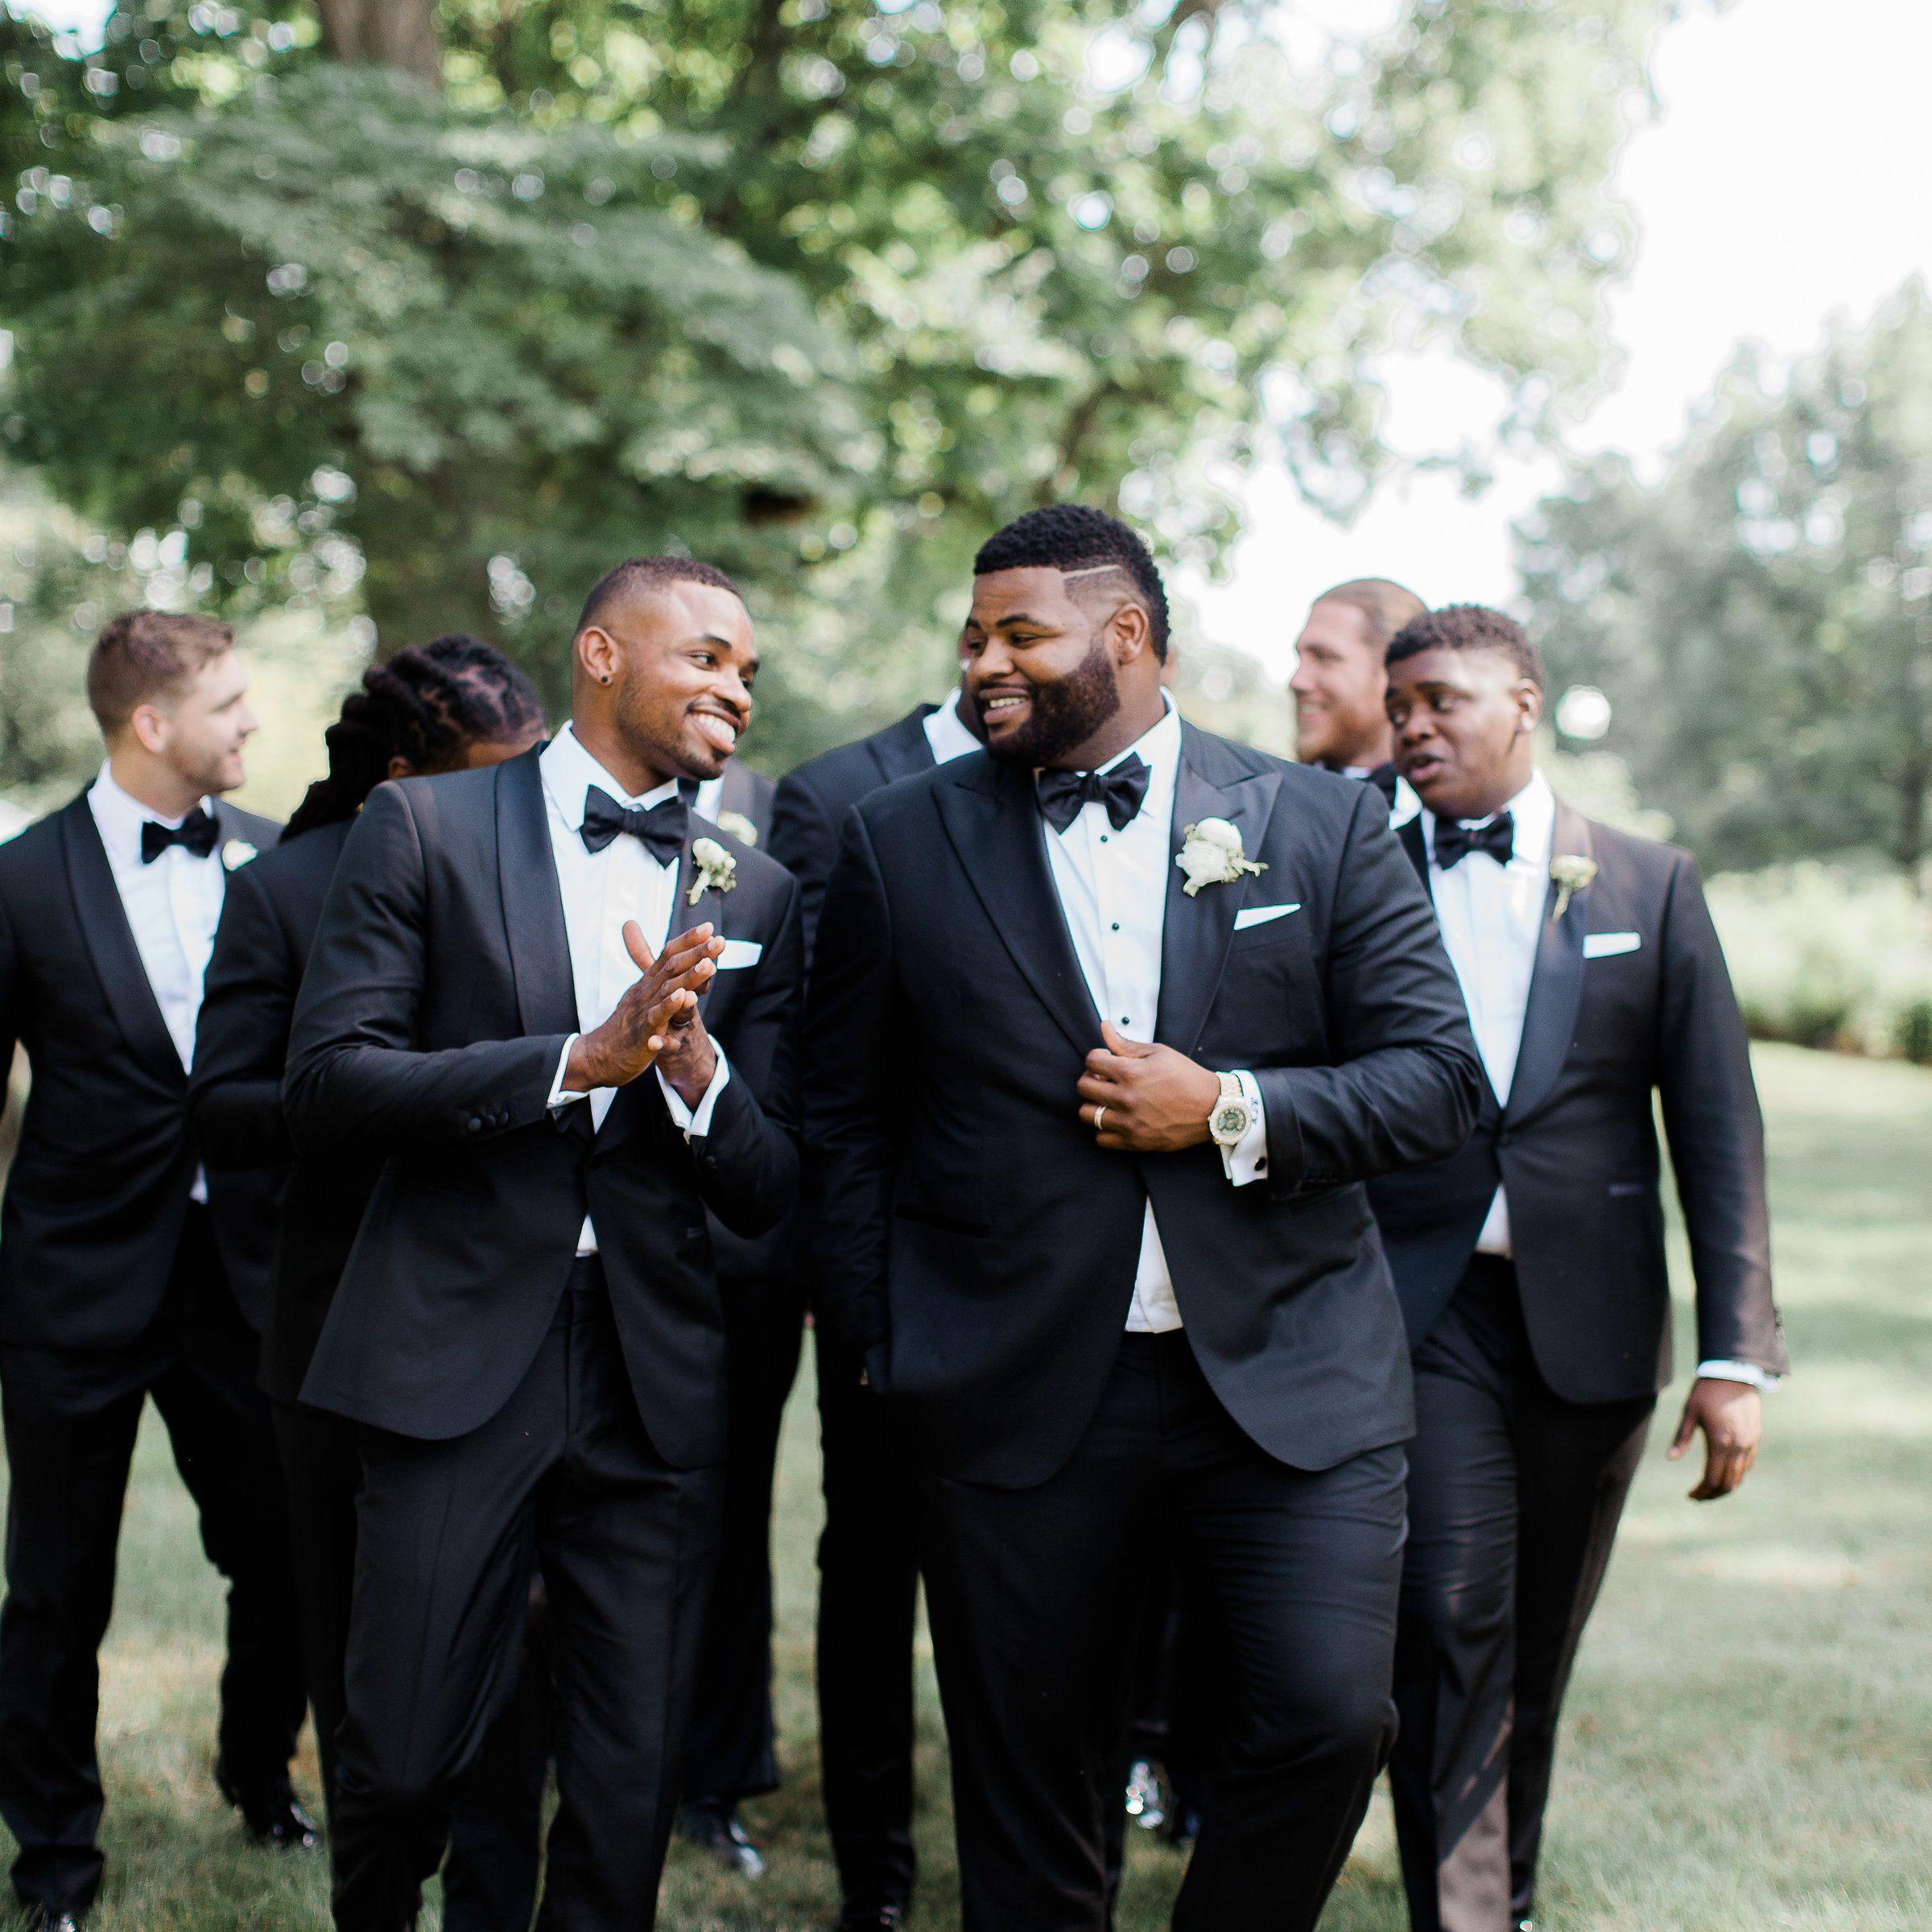 Groom 2 Personalized Wedding Handkerchief For Men Best man or Friend Dad